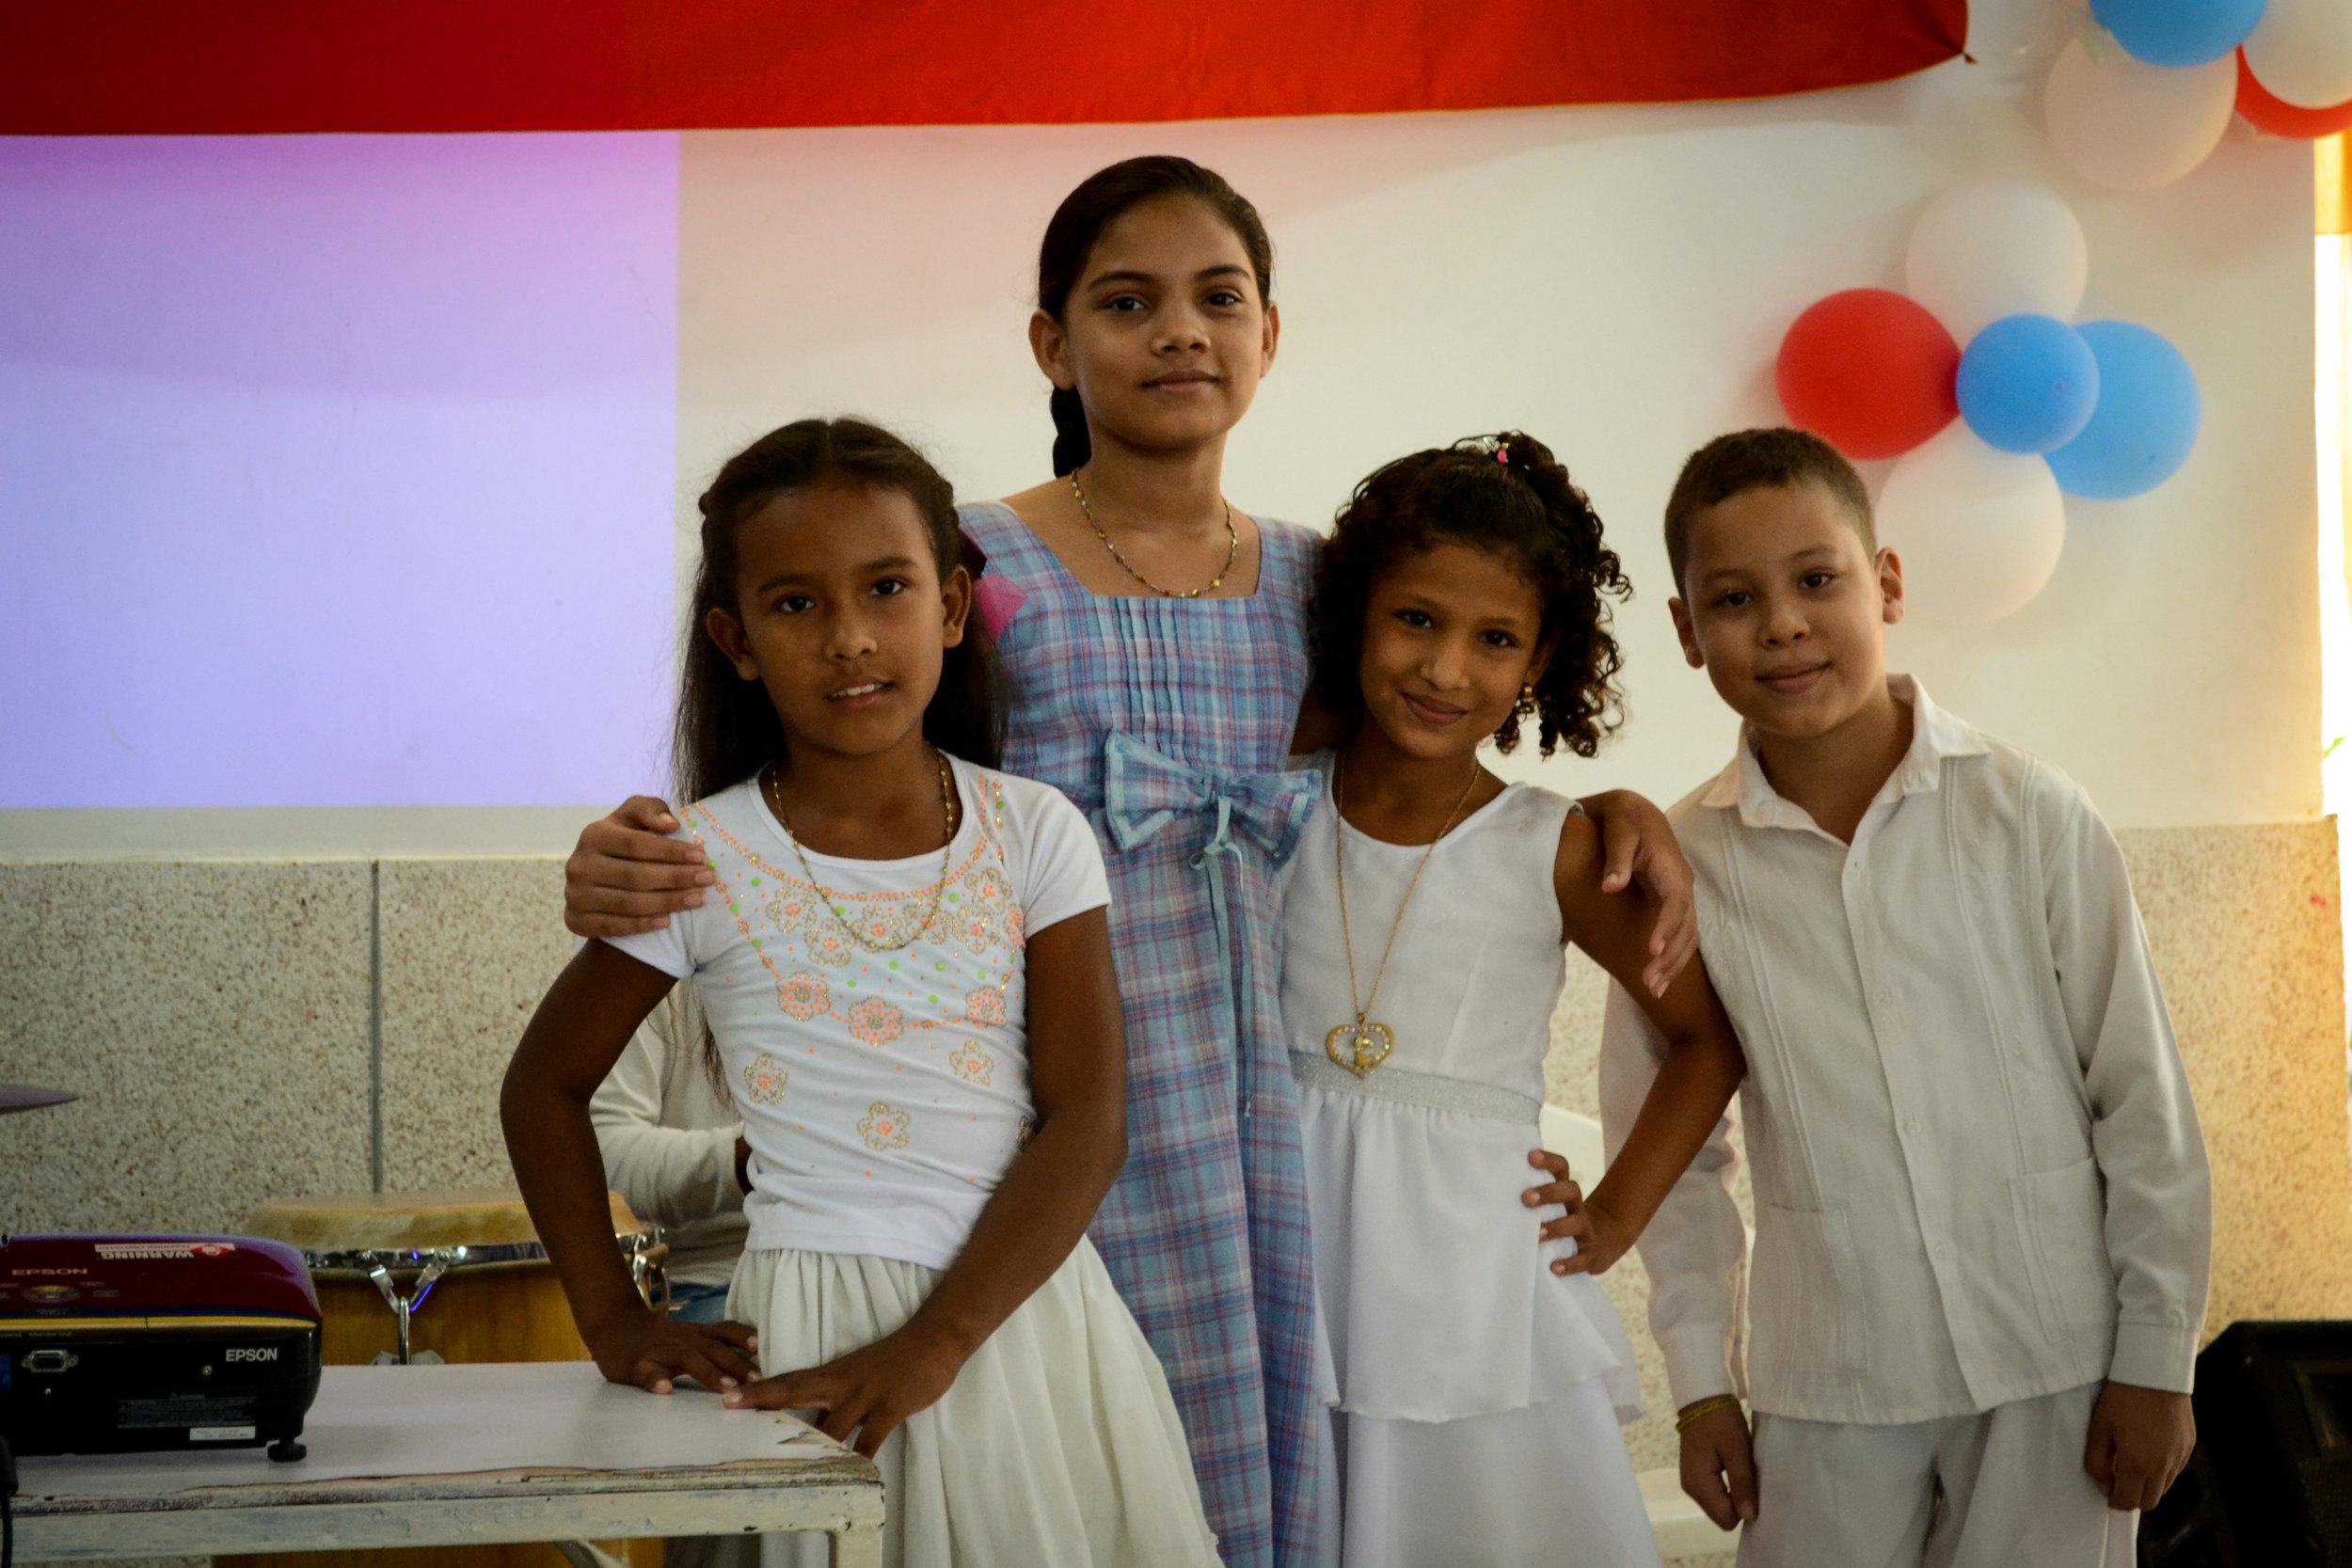 Compassion center in Colombia